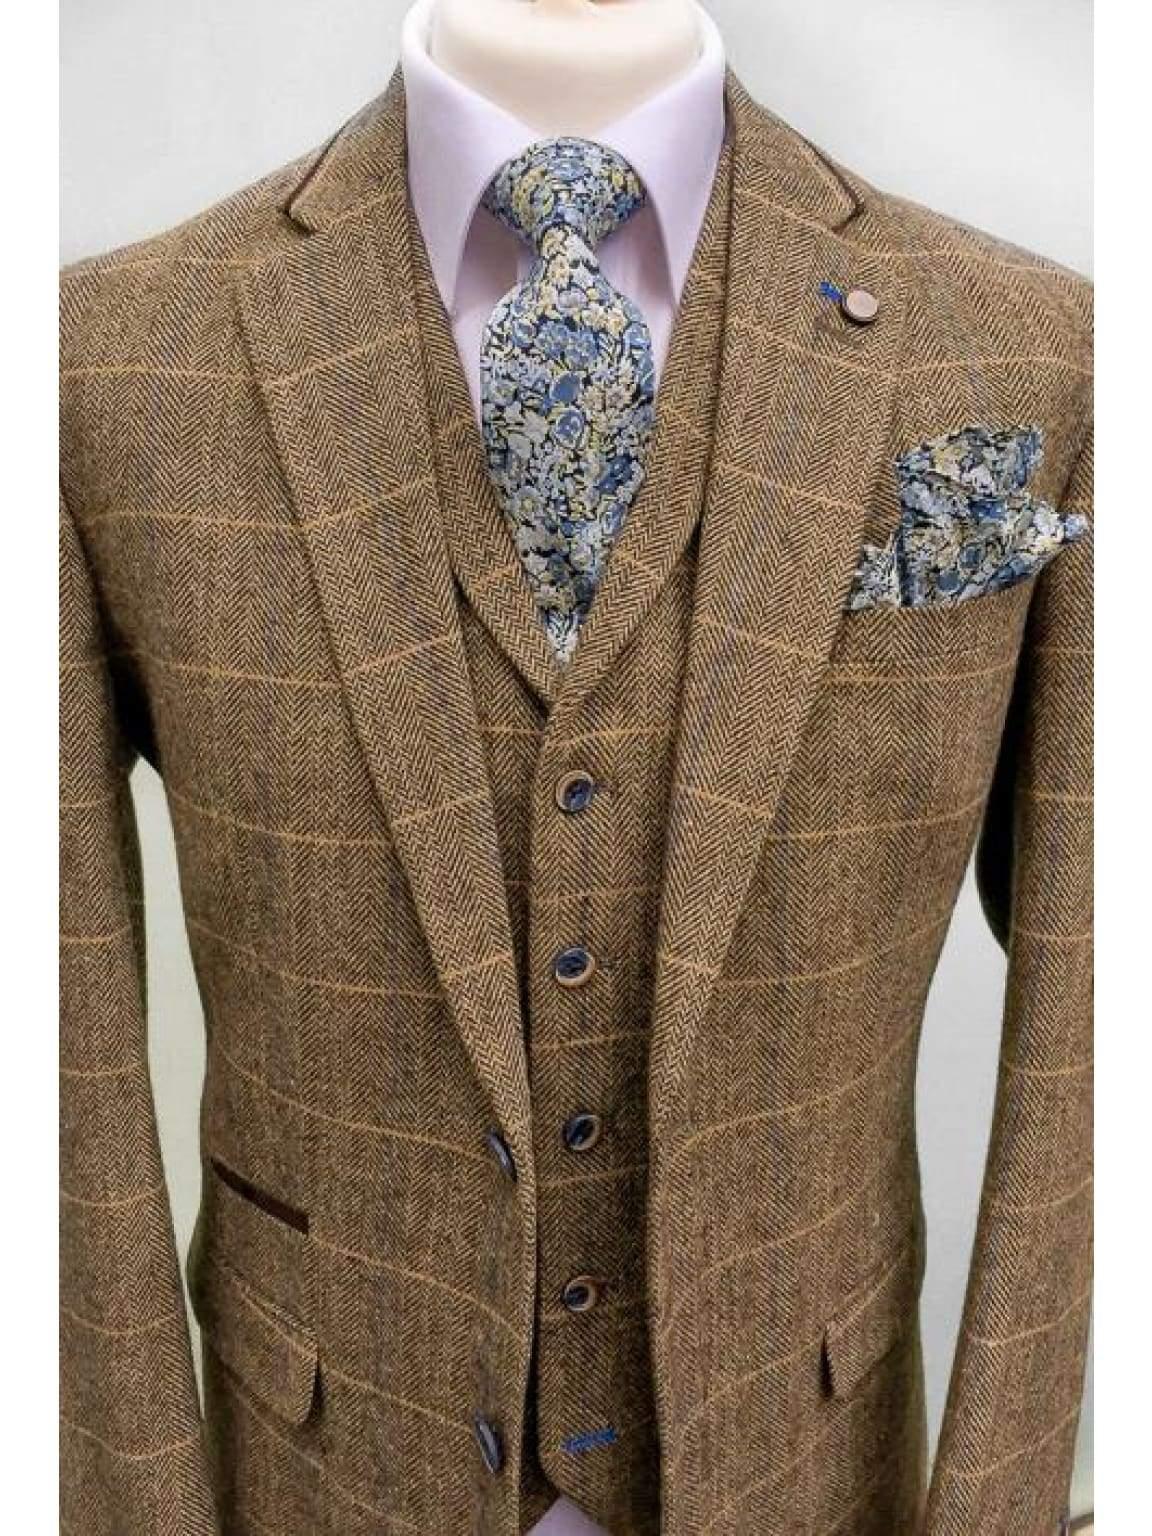 Classic Brown Tweed Suit